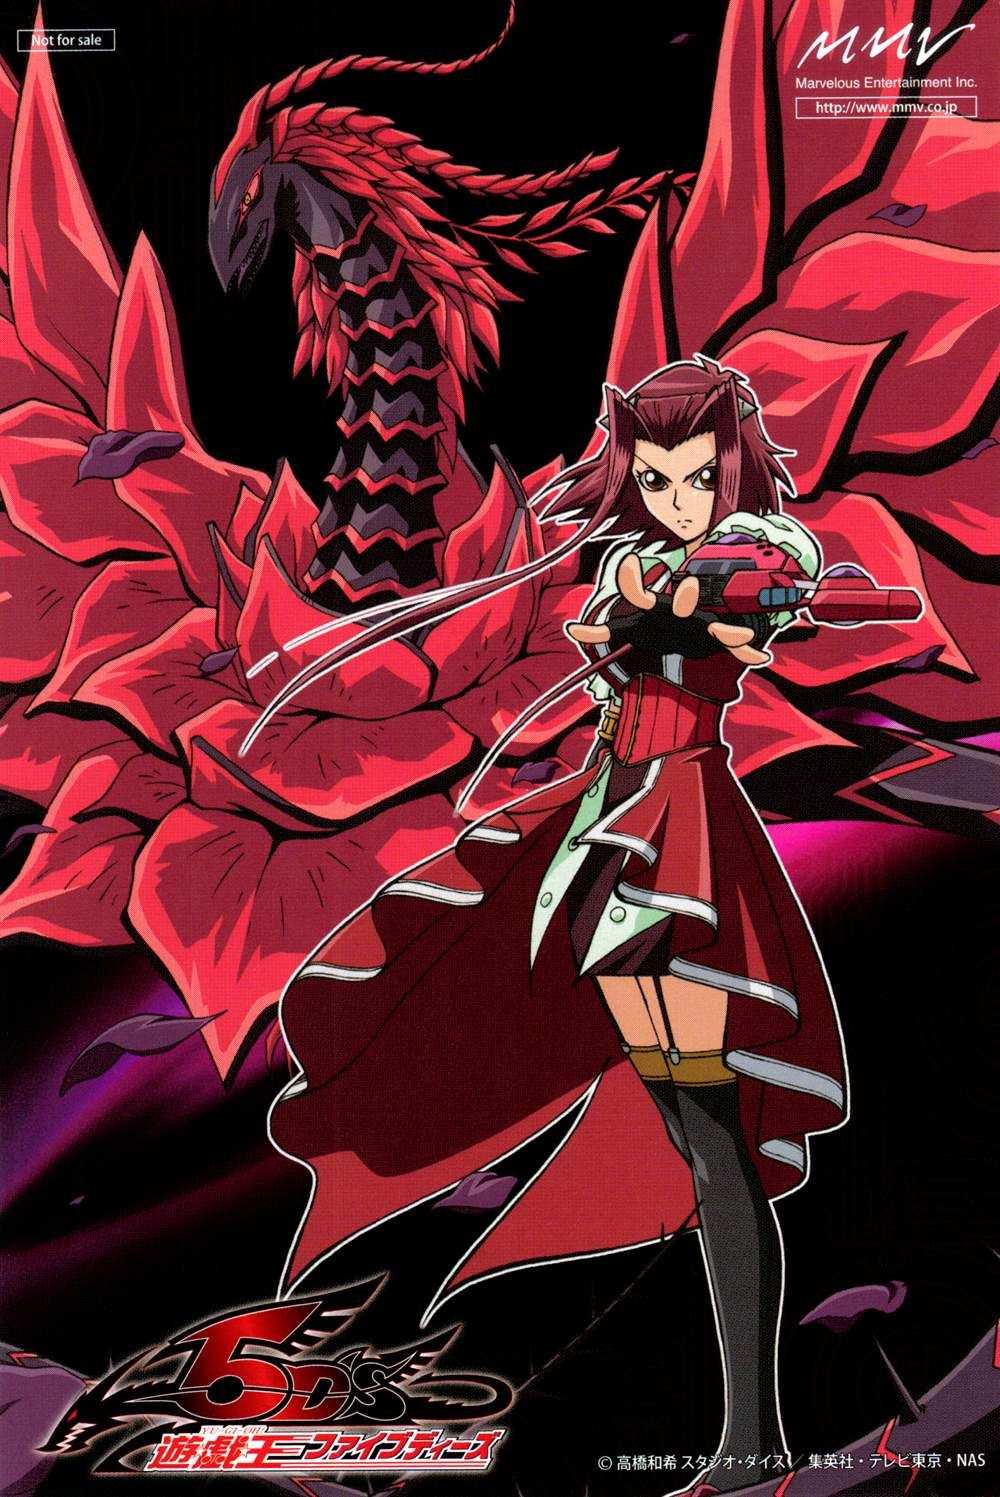 Drago rosa nera delirio puro yu gi oh ragazze anime draghi y